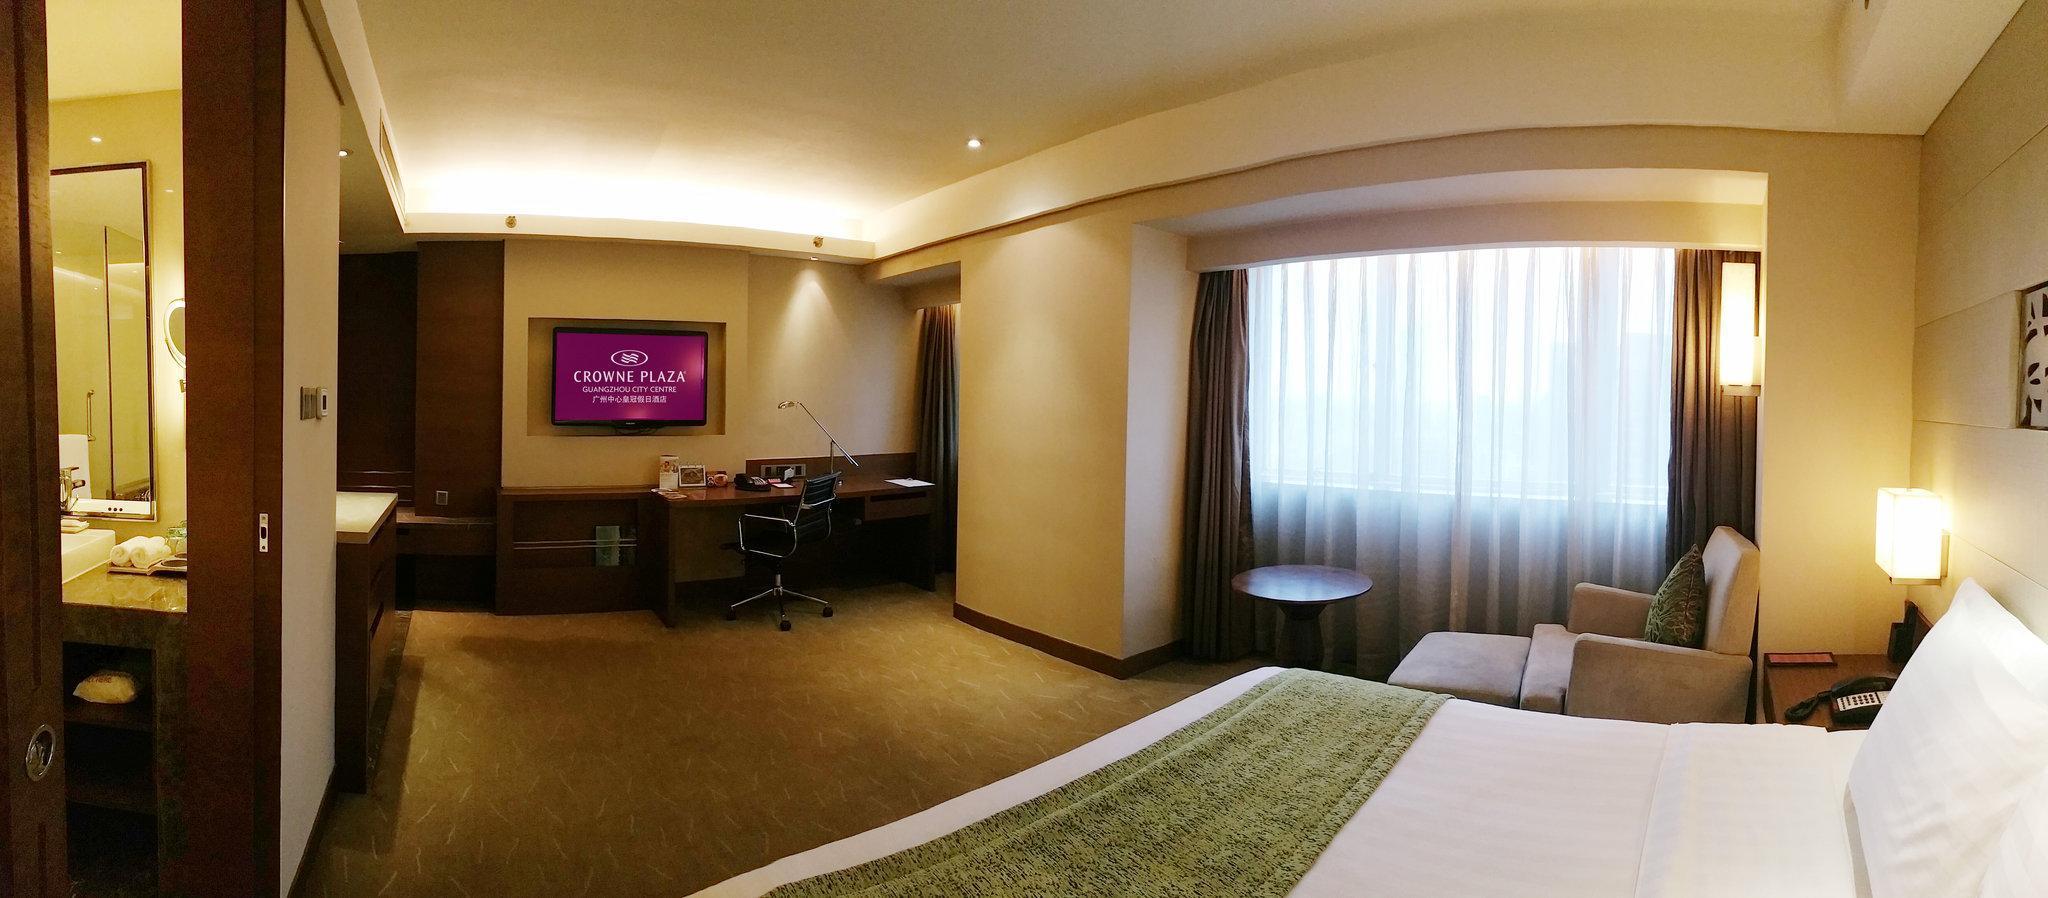 Crowne Plaza Guangzhou City Centre Hotel Deals Photos Reviews